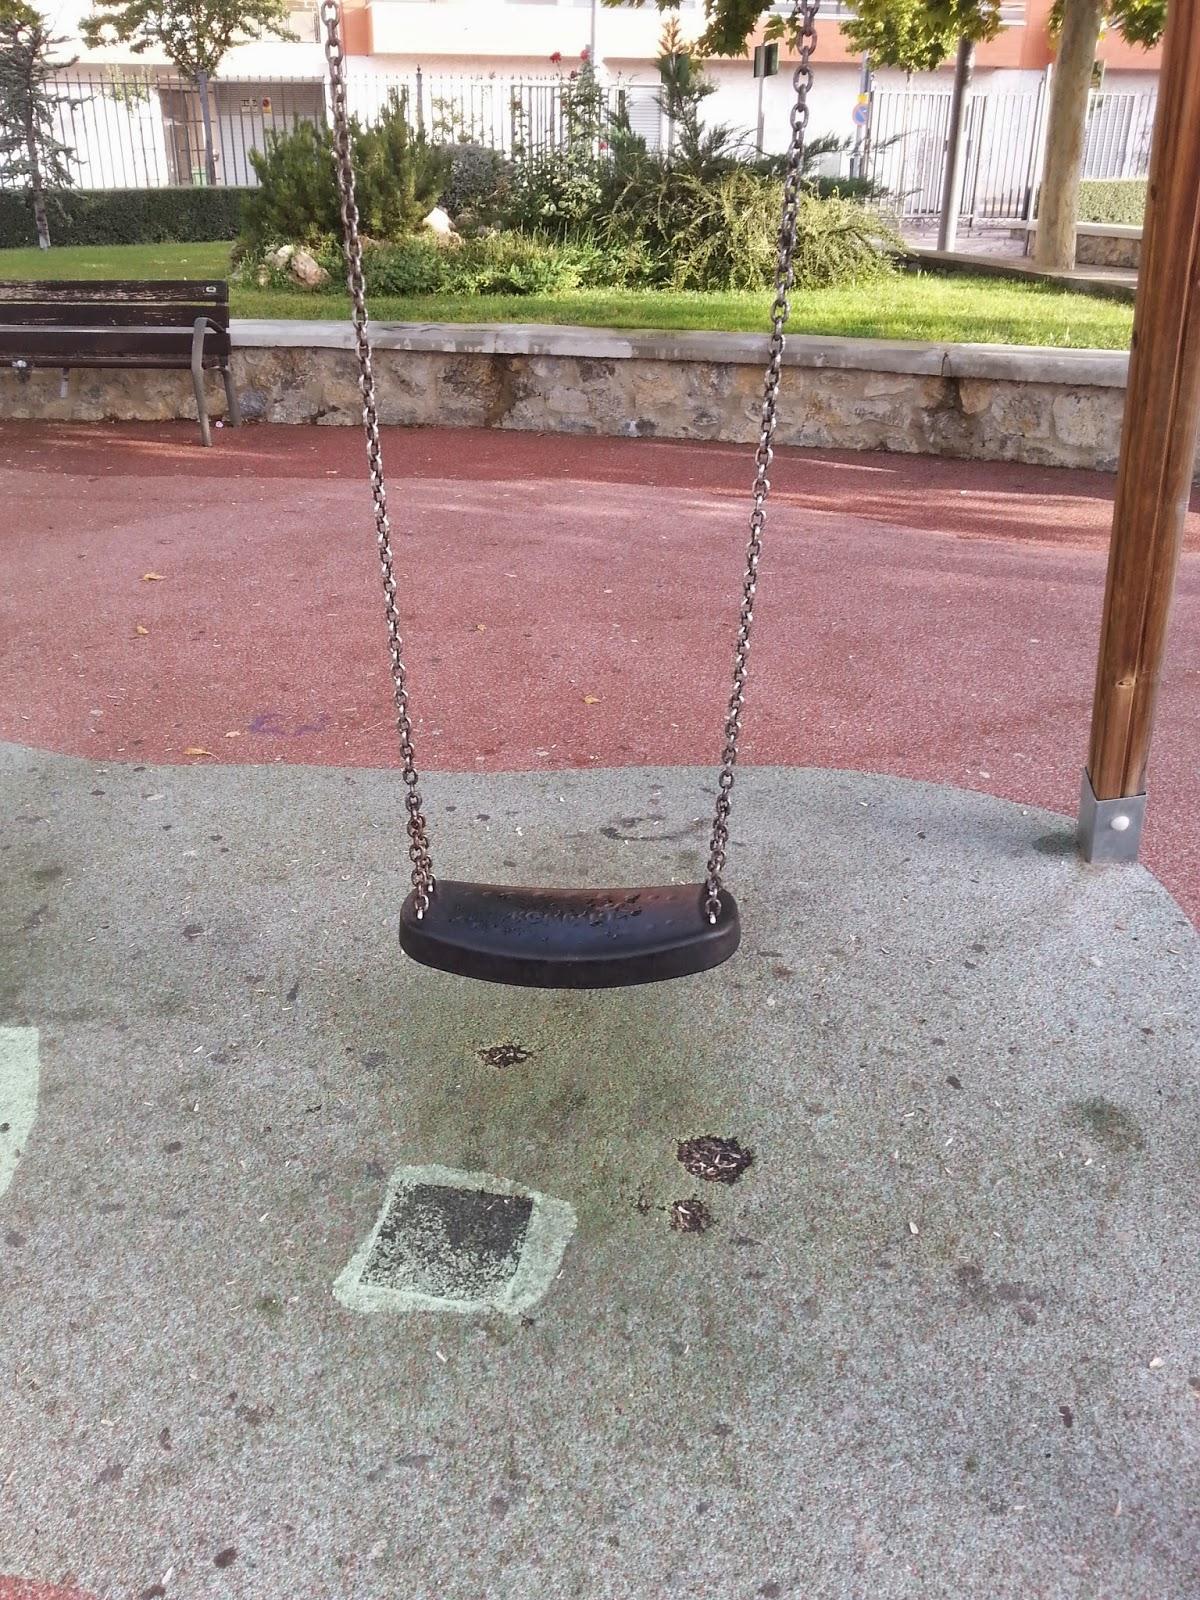 Parques que sí; parques que no en Caravaca: los columpios para bebés ...